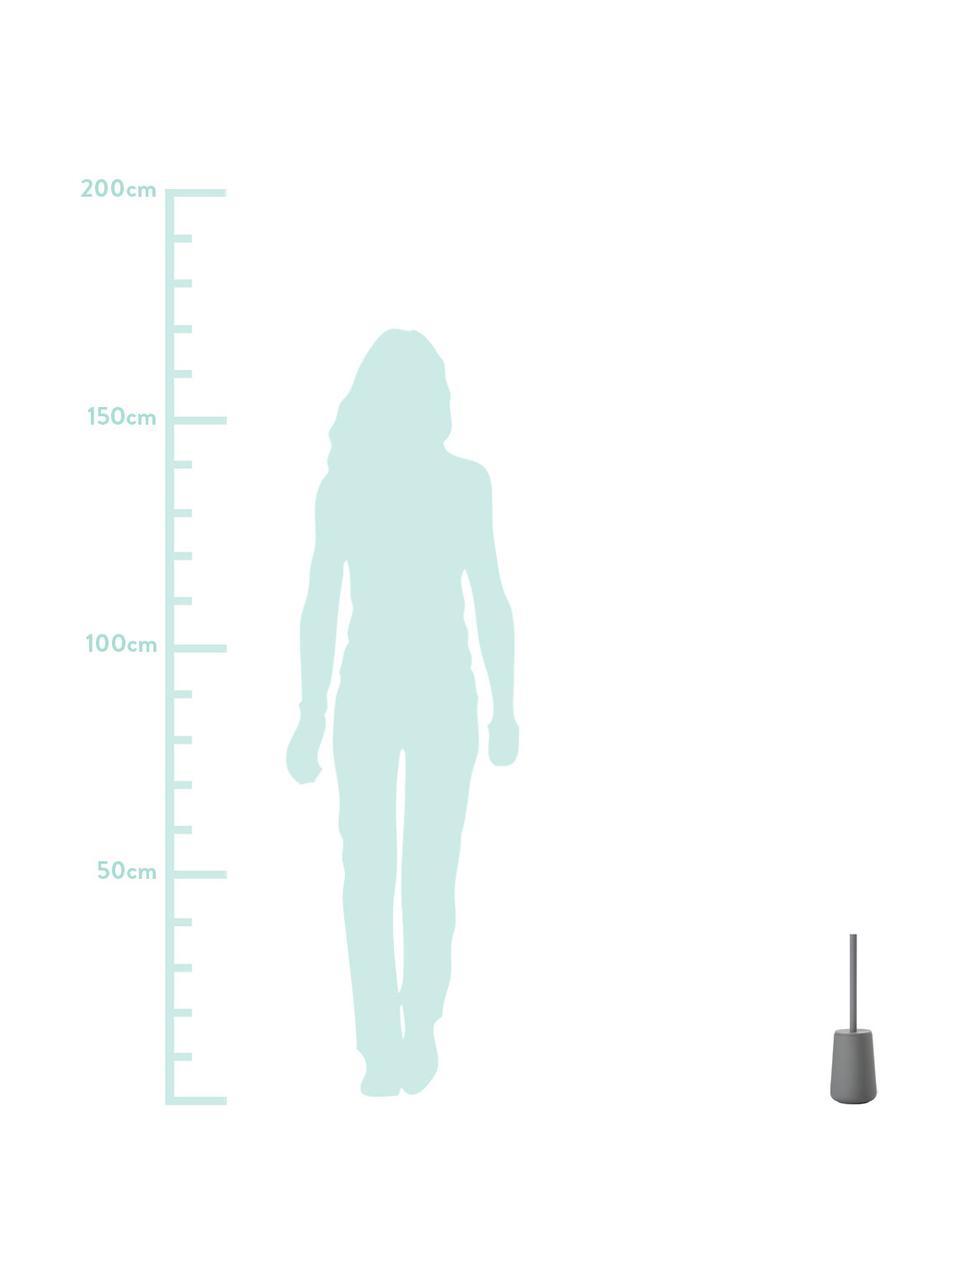 Toilettenbürste Nova One mit Porzellan-Behälter, Behälter: Porzellan, Griff: Edelstahl, matt lackiert, Grau, Ø 10 x H 43 cm